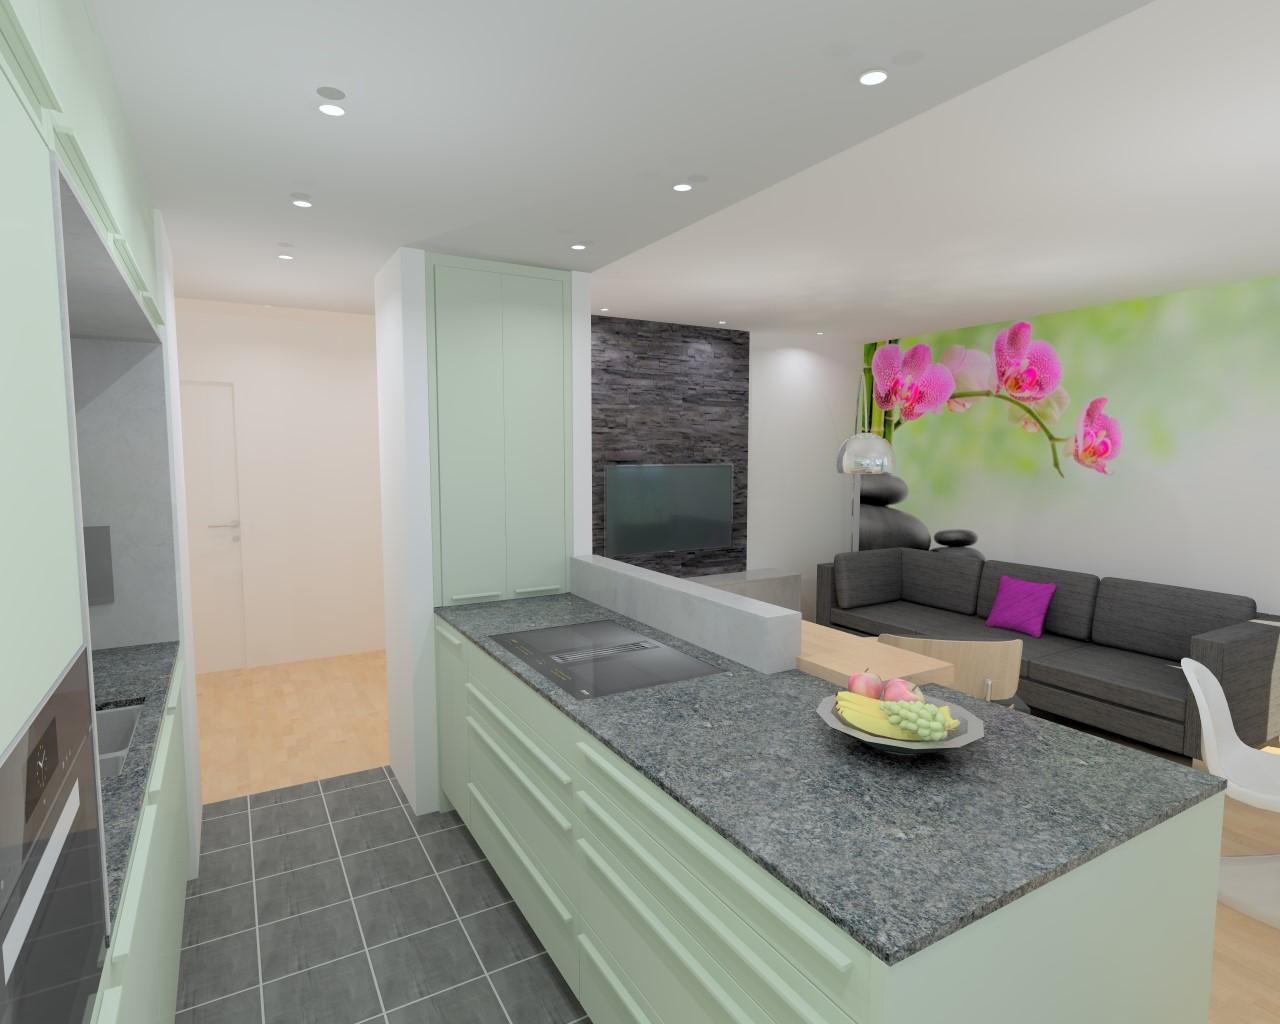 k chenwerkstatt amberg le corbusier vert anglais p le. Black Bedroom Furniture Sets. Home Design Ideas